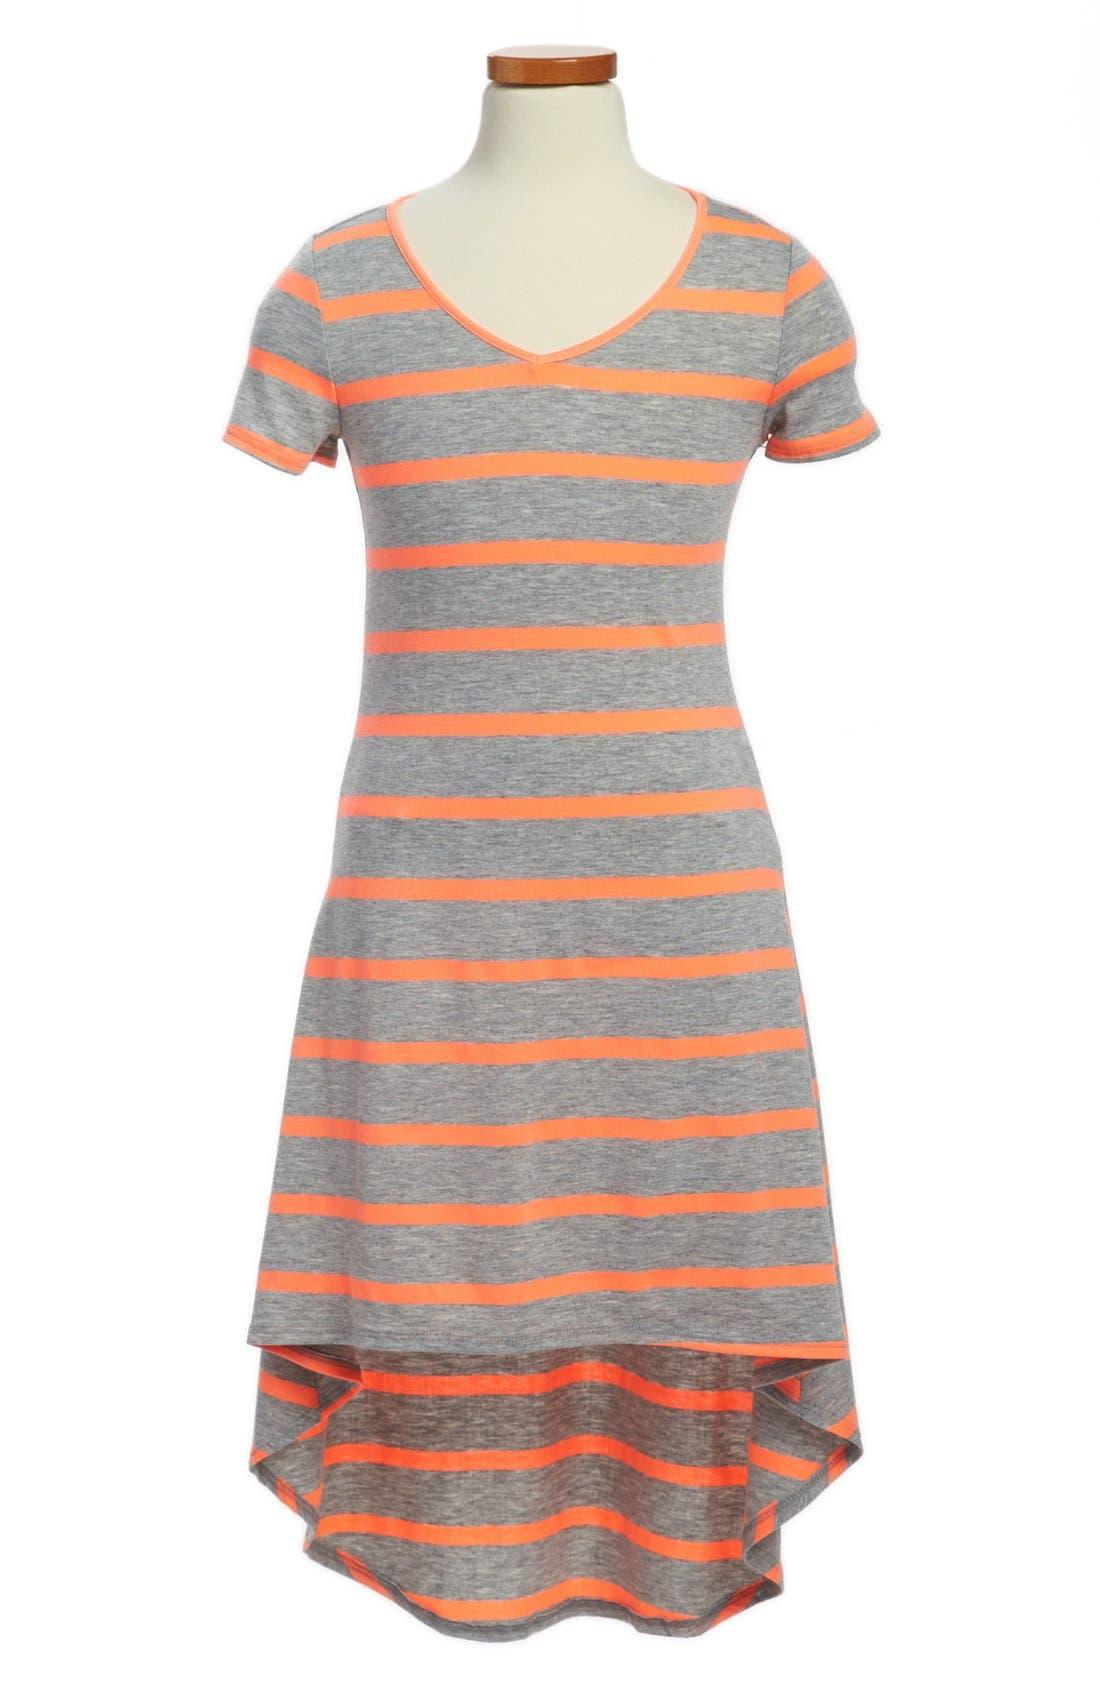 Alternate Image 1 Selected - Soprano Stripe High/Low Dress (Little Girls & Big Girls)